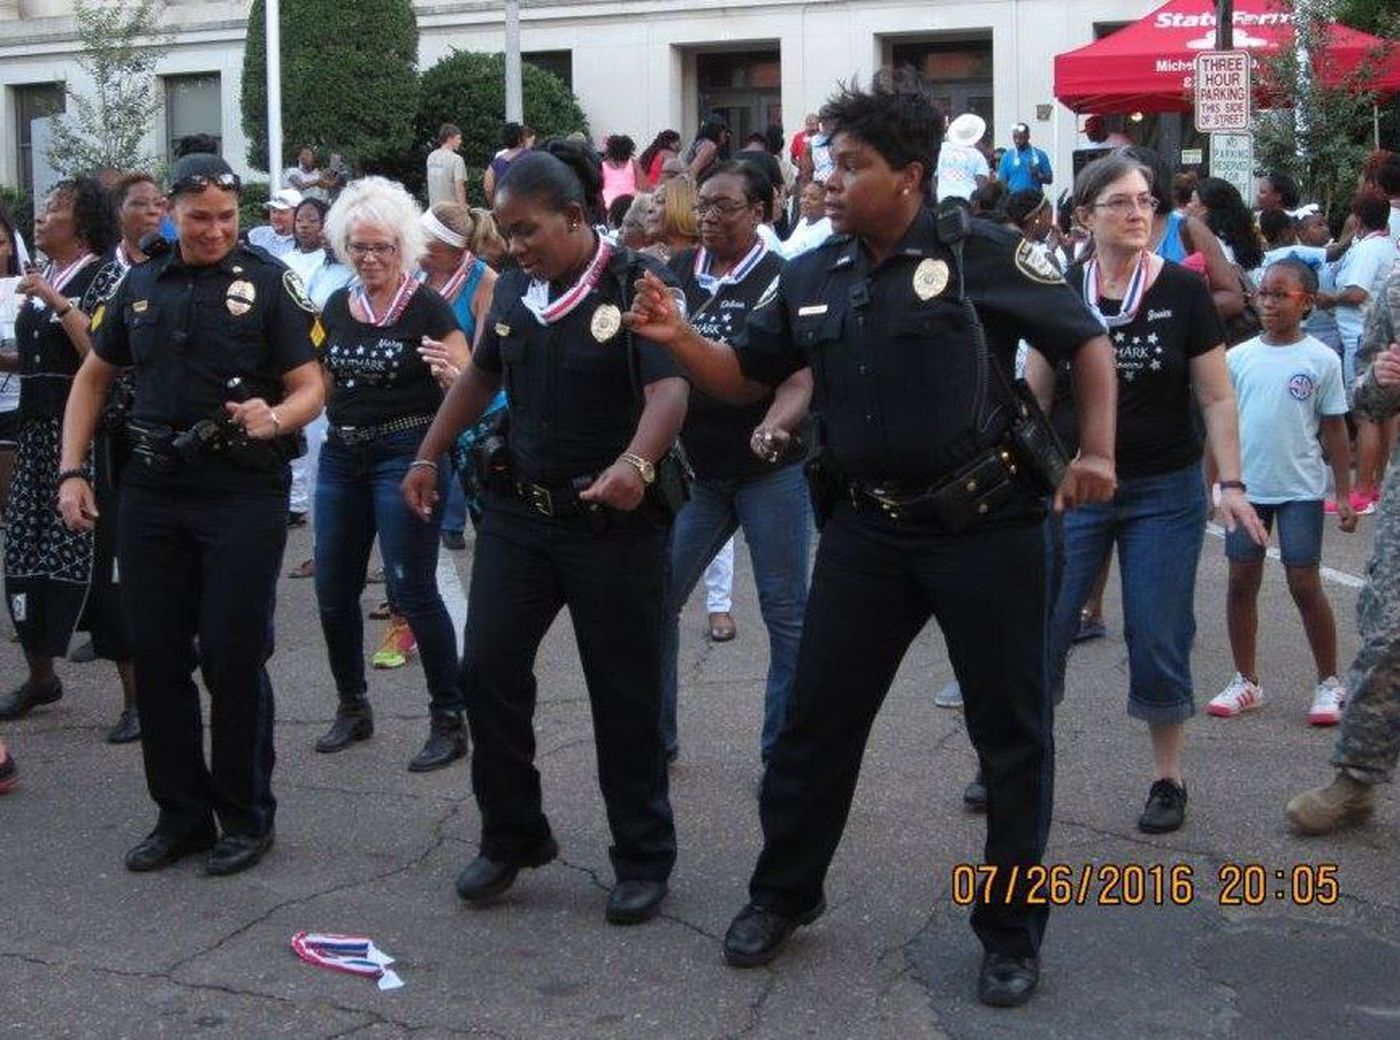 Swar Police Officers 'Step In The Name Of Love' intended for El Dorado Court Calendar